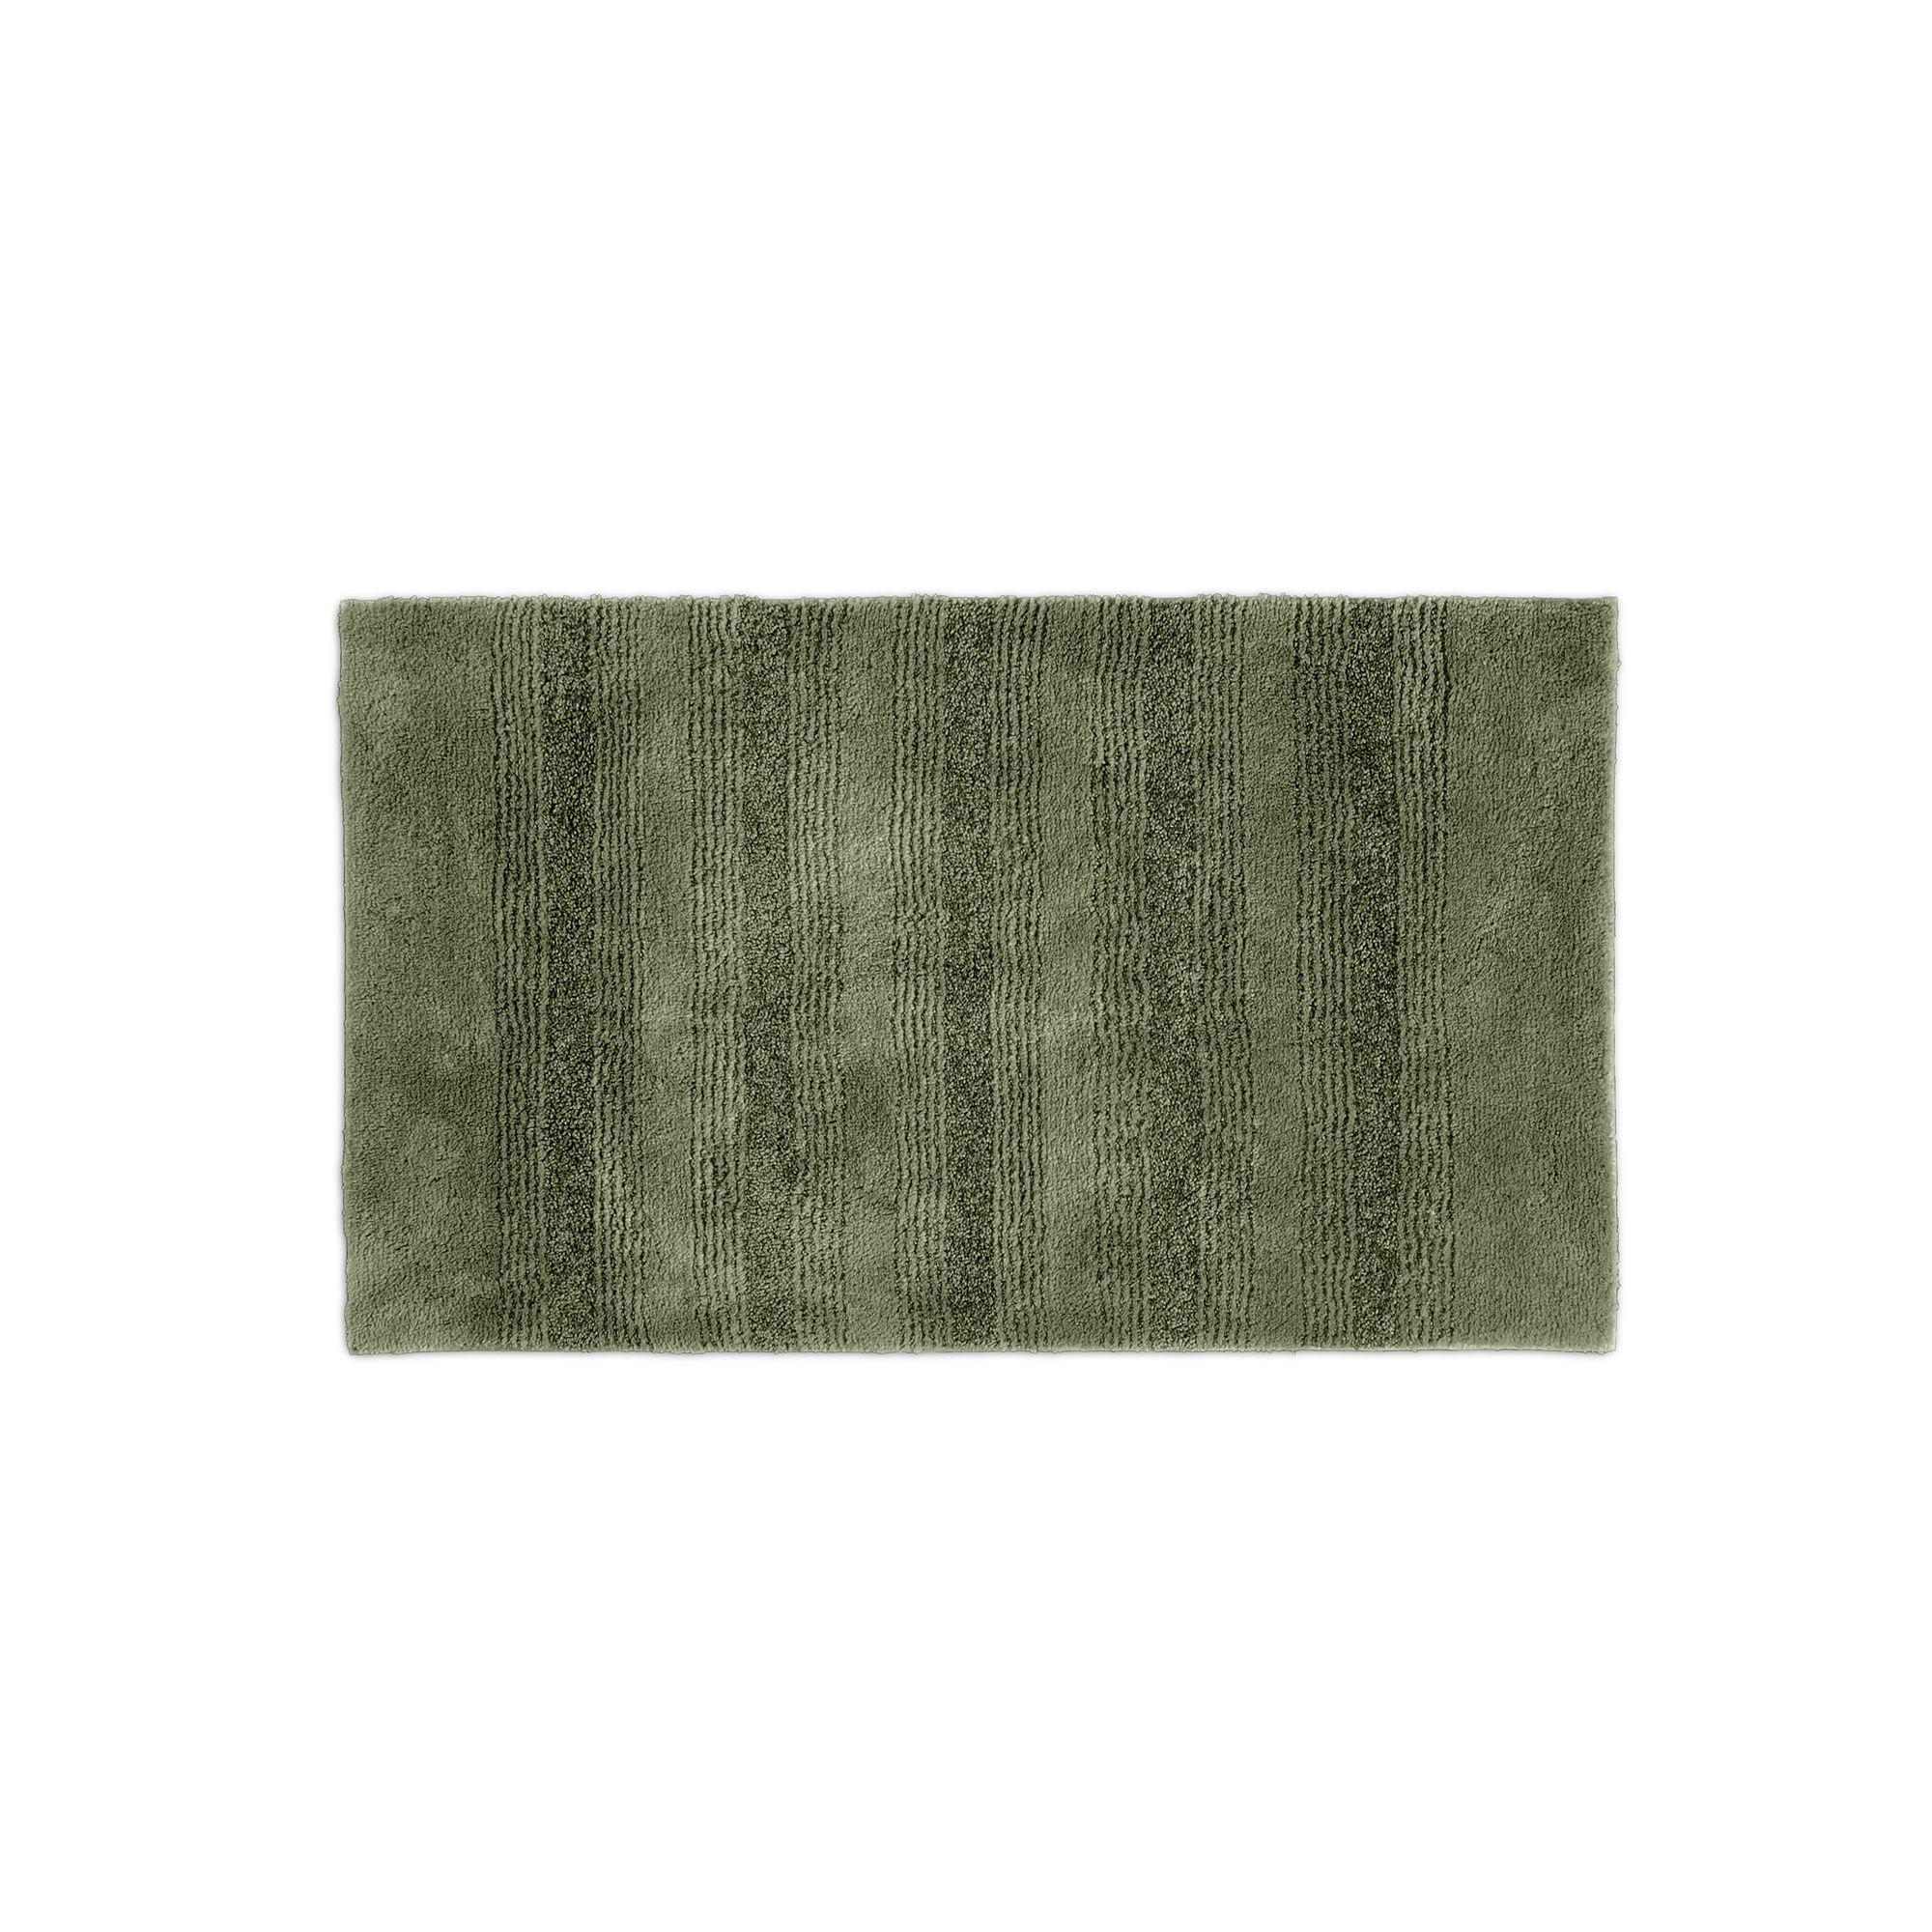 Garland Rug Enclave Bath 24 X 40